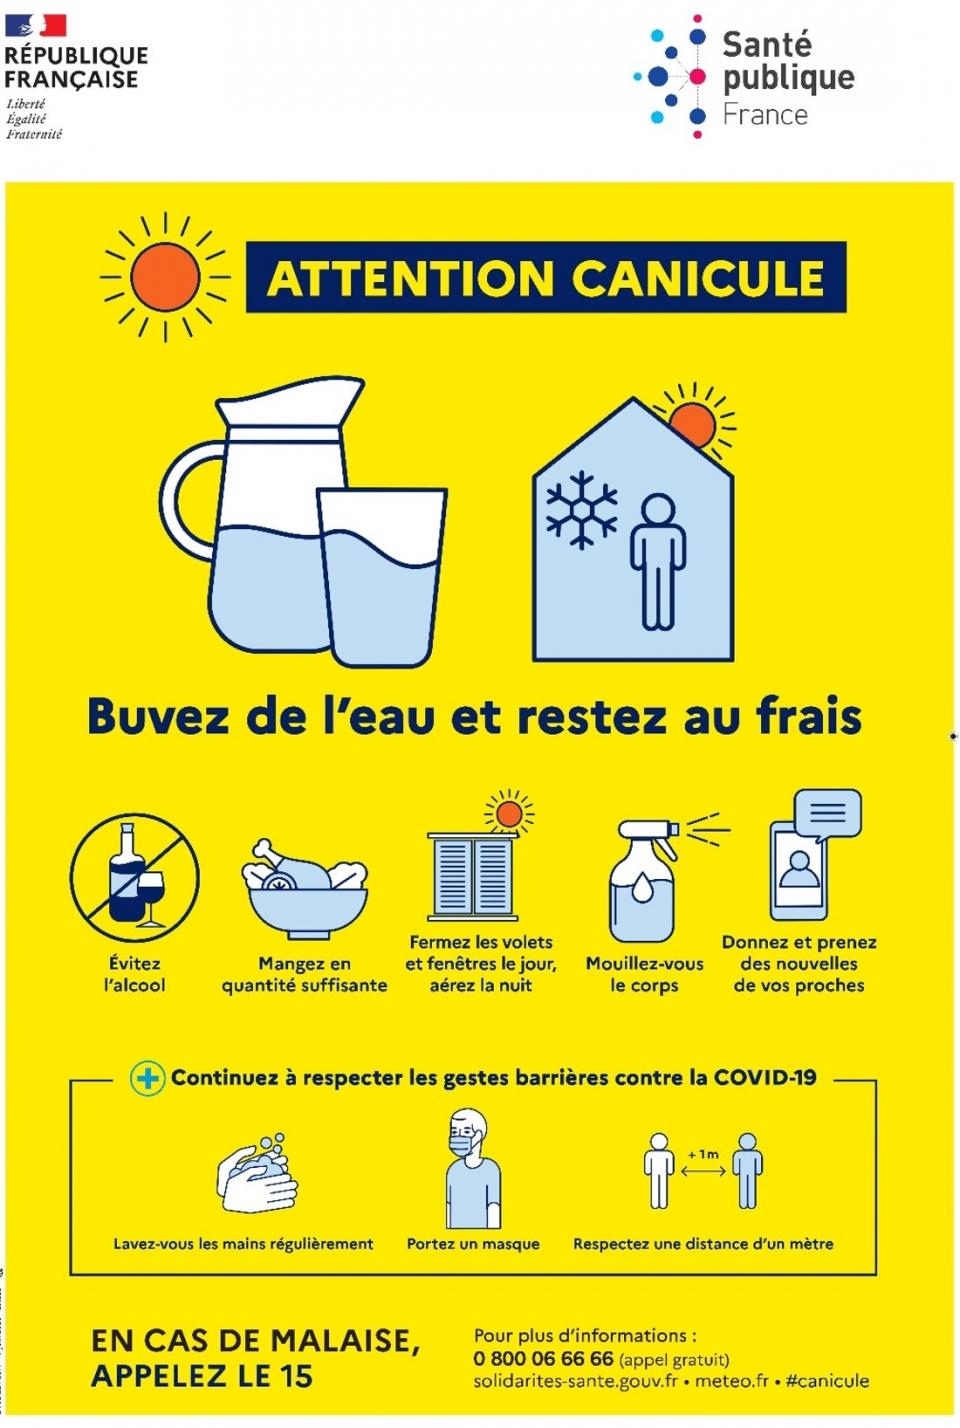 Canicule | Gouvernement.fr